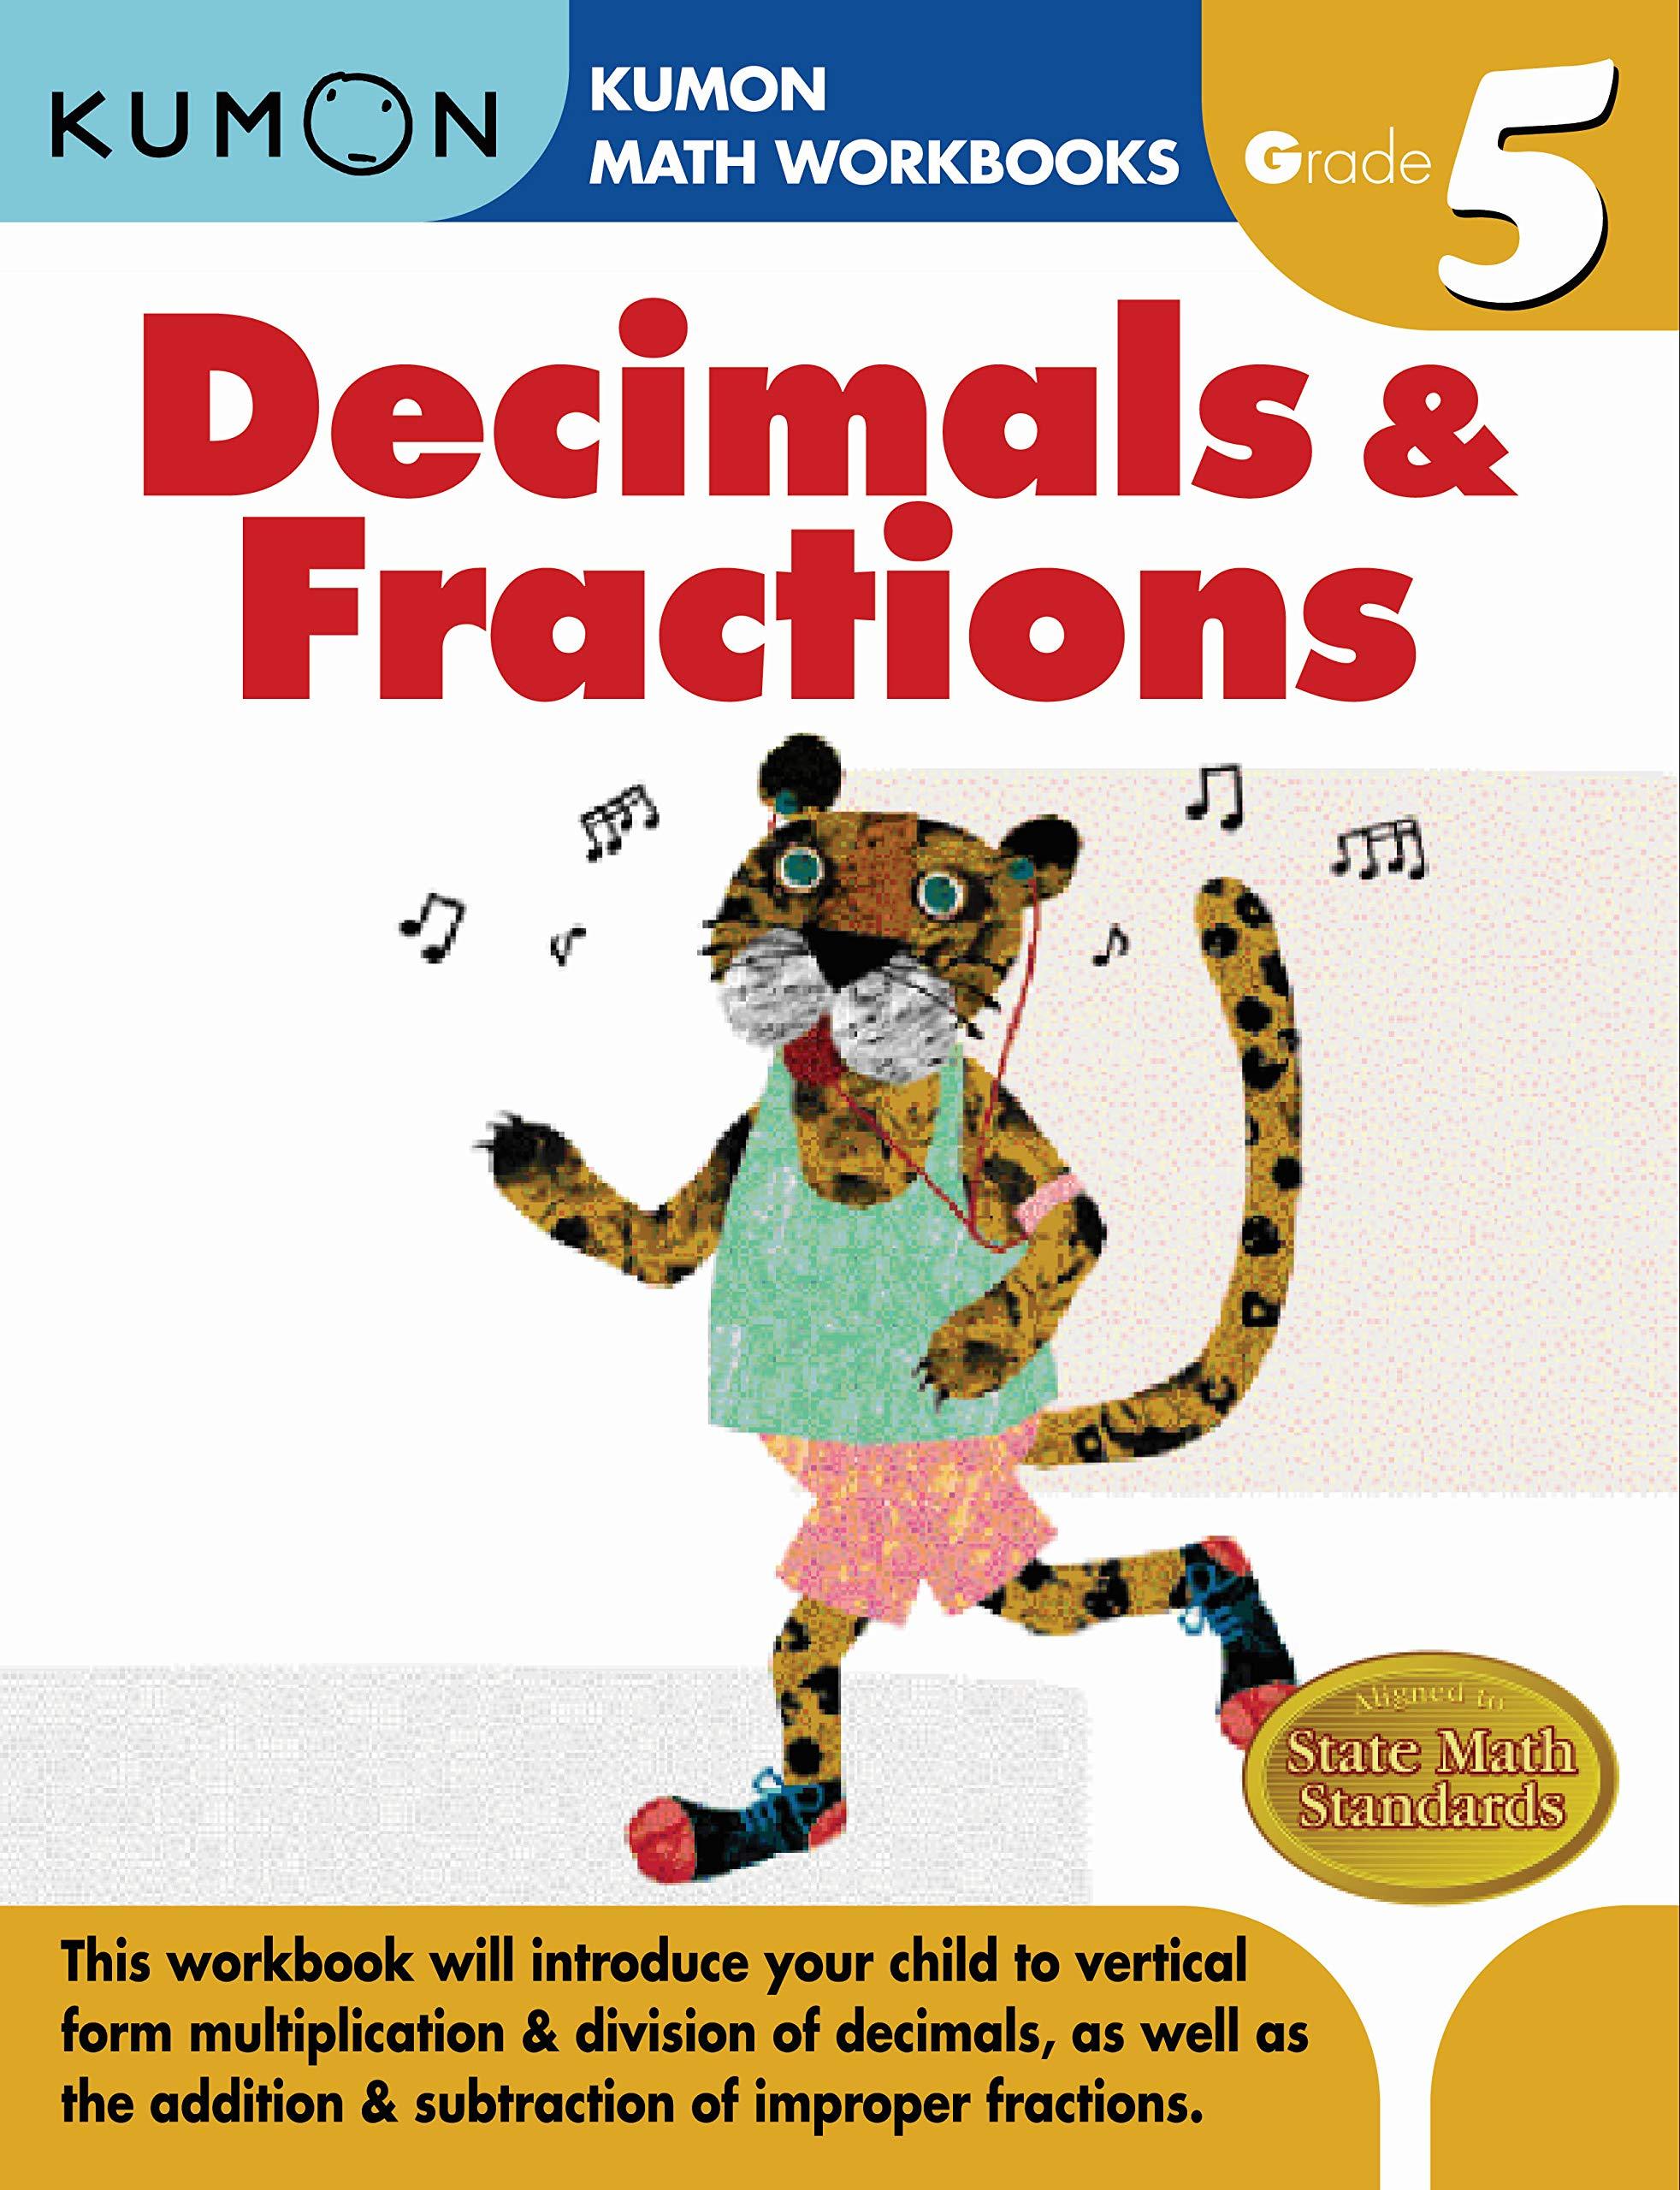 Buy Grade 5 Decimals Fractions Kumon Math Workbooks Book Online At Low Prices In India Grade 5 Decimals Fractions Kumon Math Workbooks Reviews Ratings Amazon In [ 2560 x 1964 Pixel ]